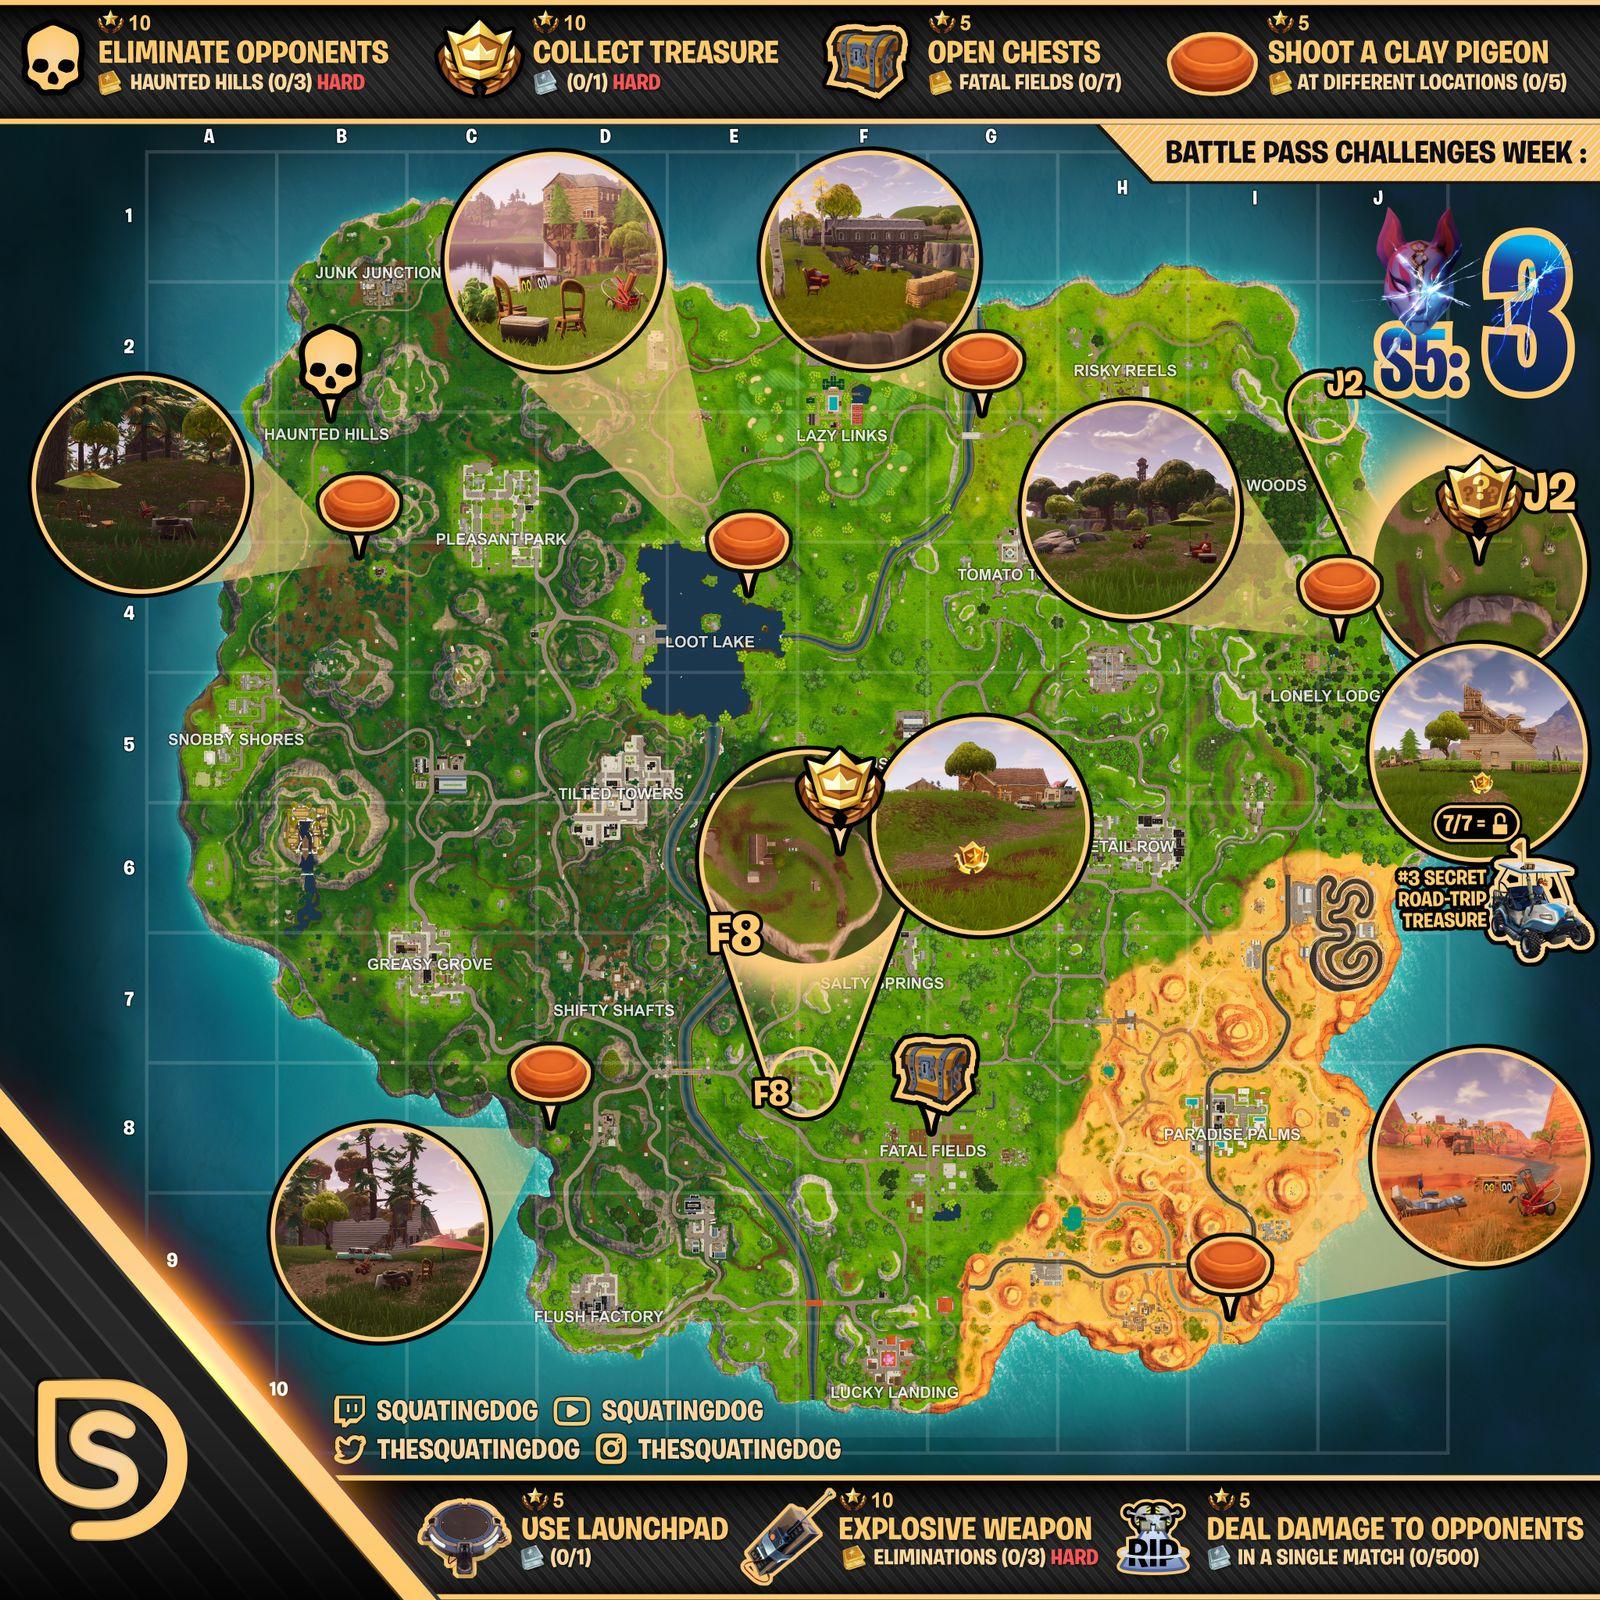 Cheat Sheet Map for Fortnite Battle Royale Season 5, Week 3 ...